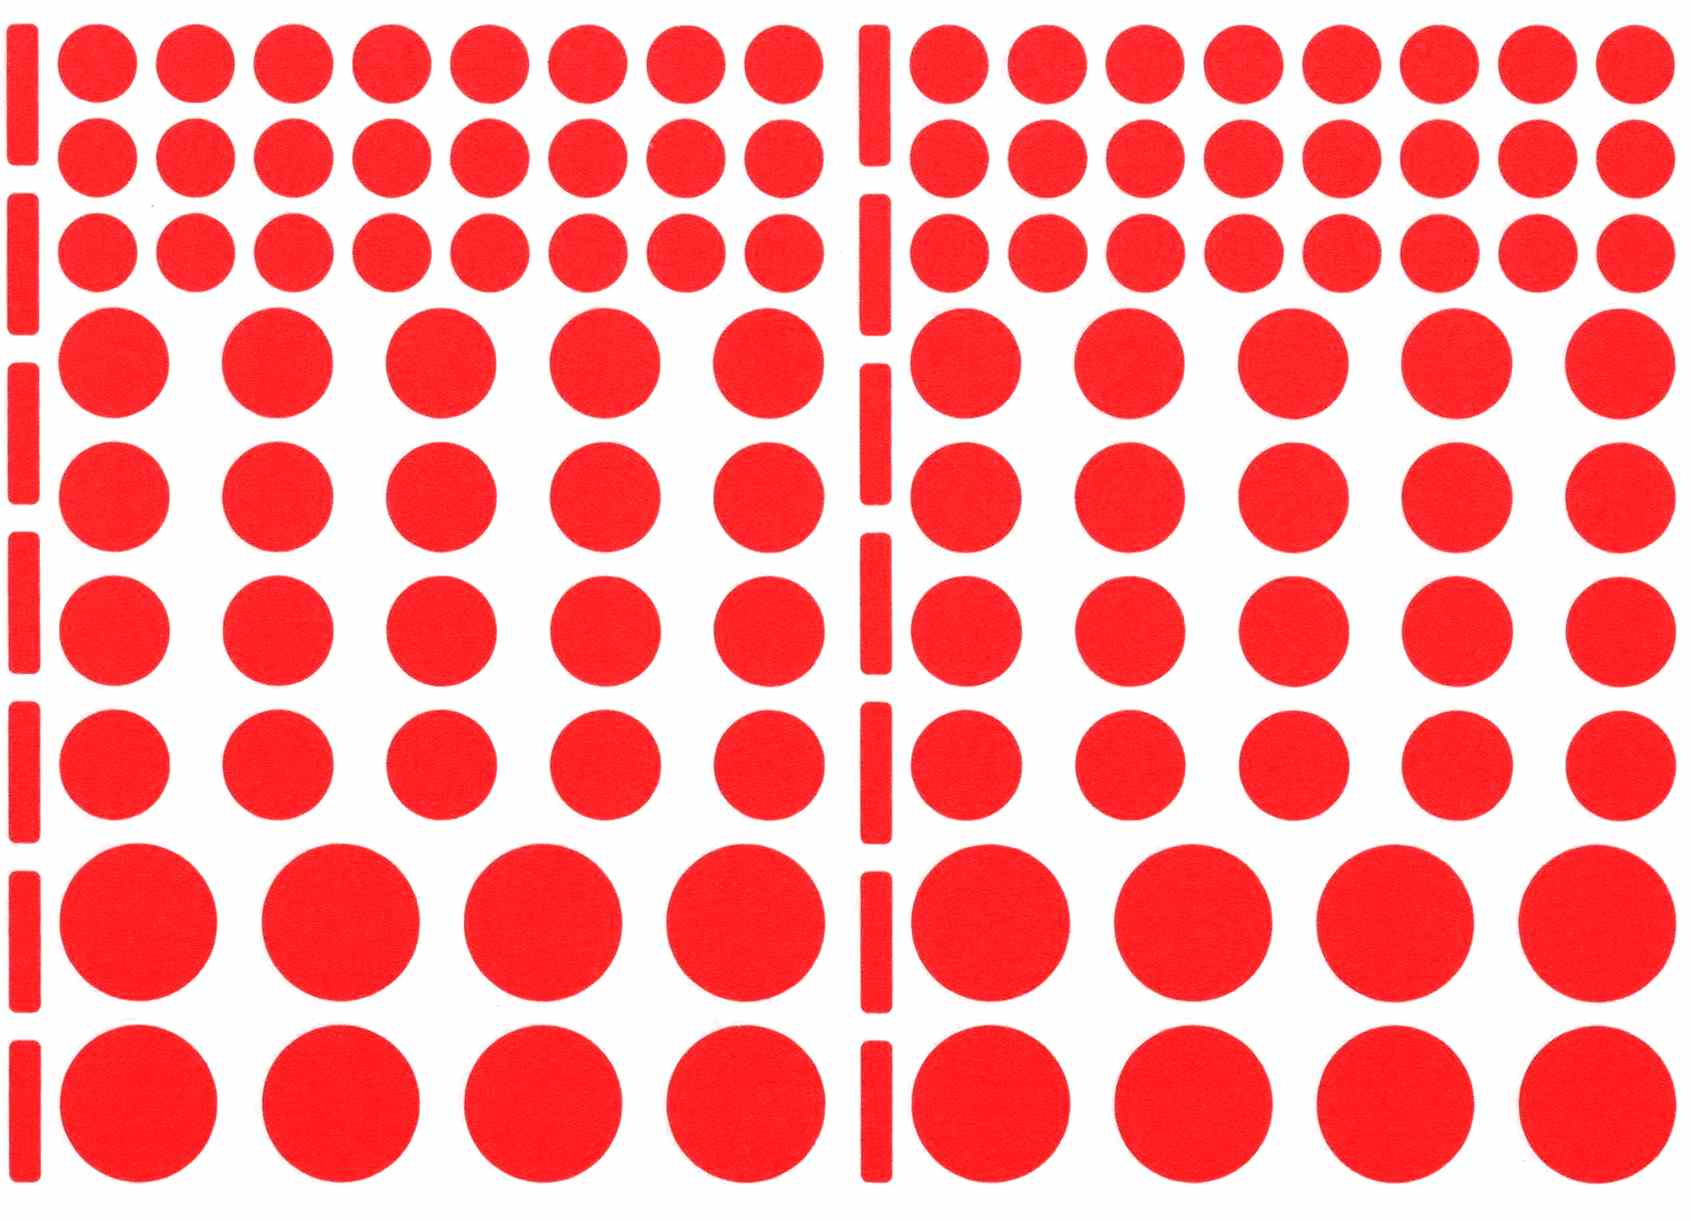 104 gommettes rondes rouge